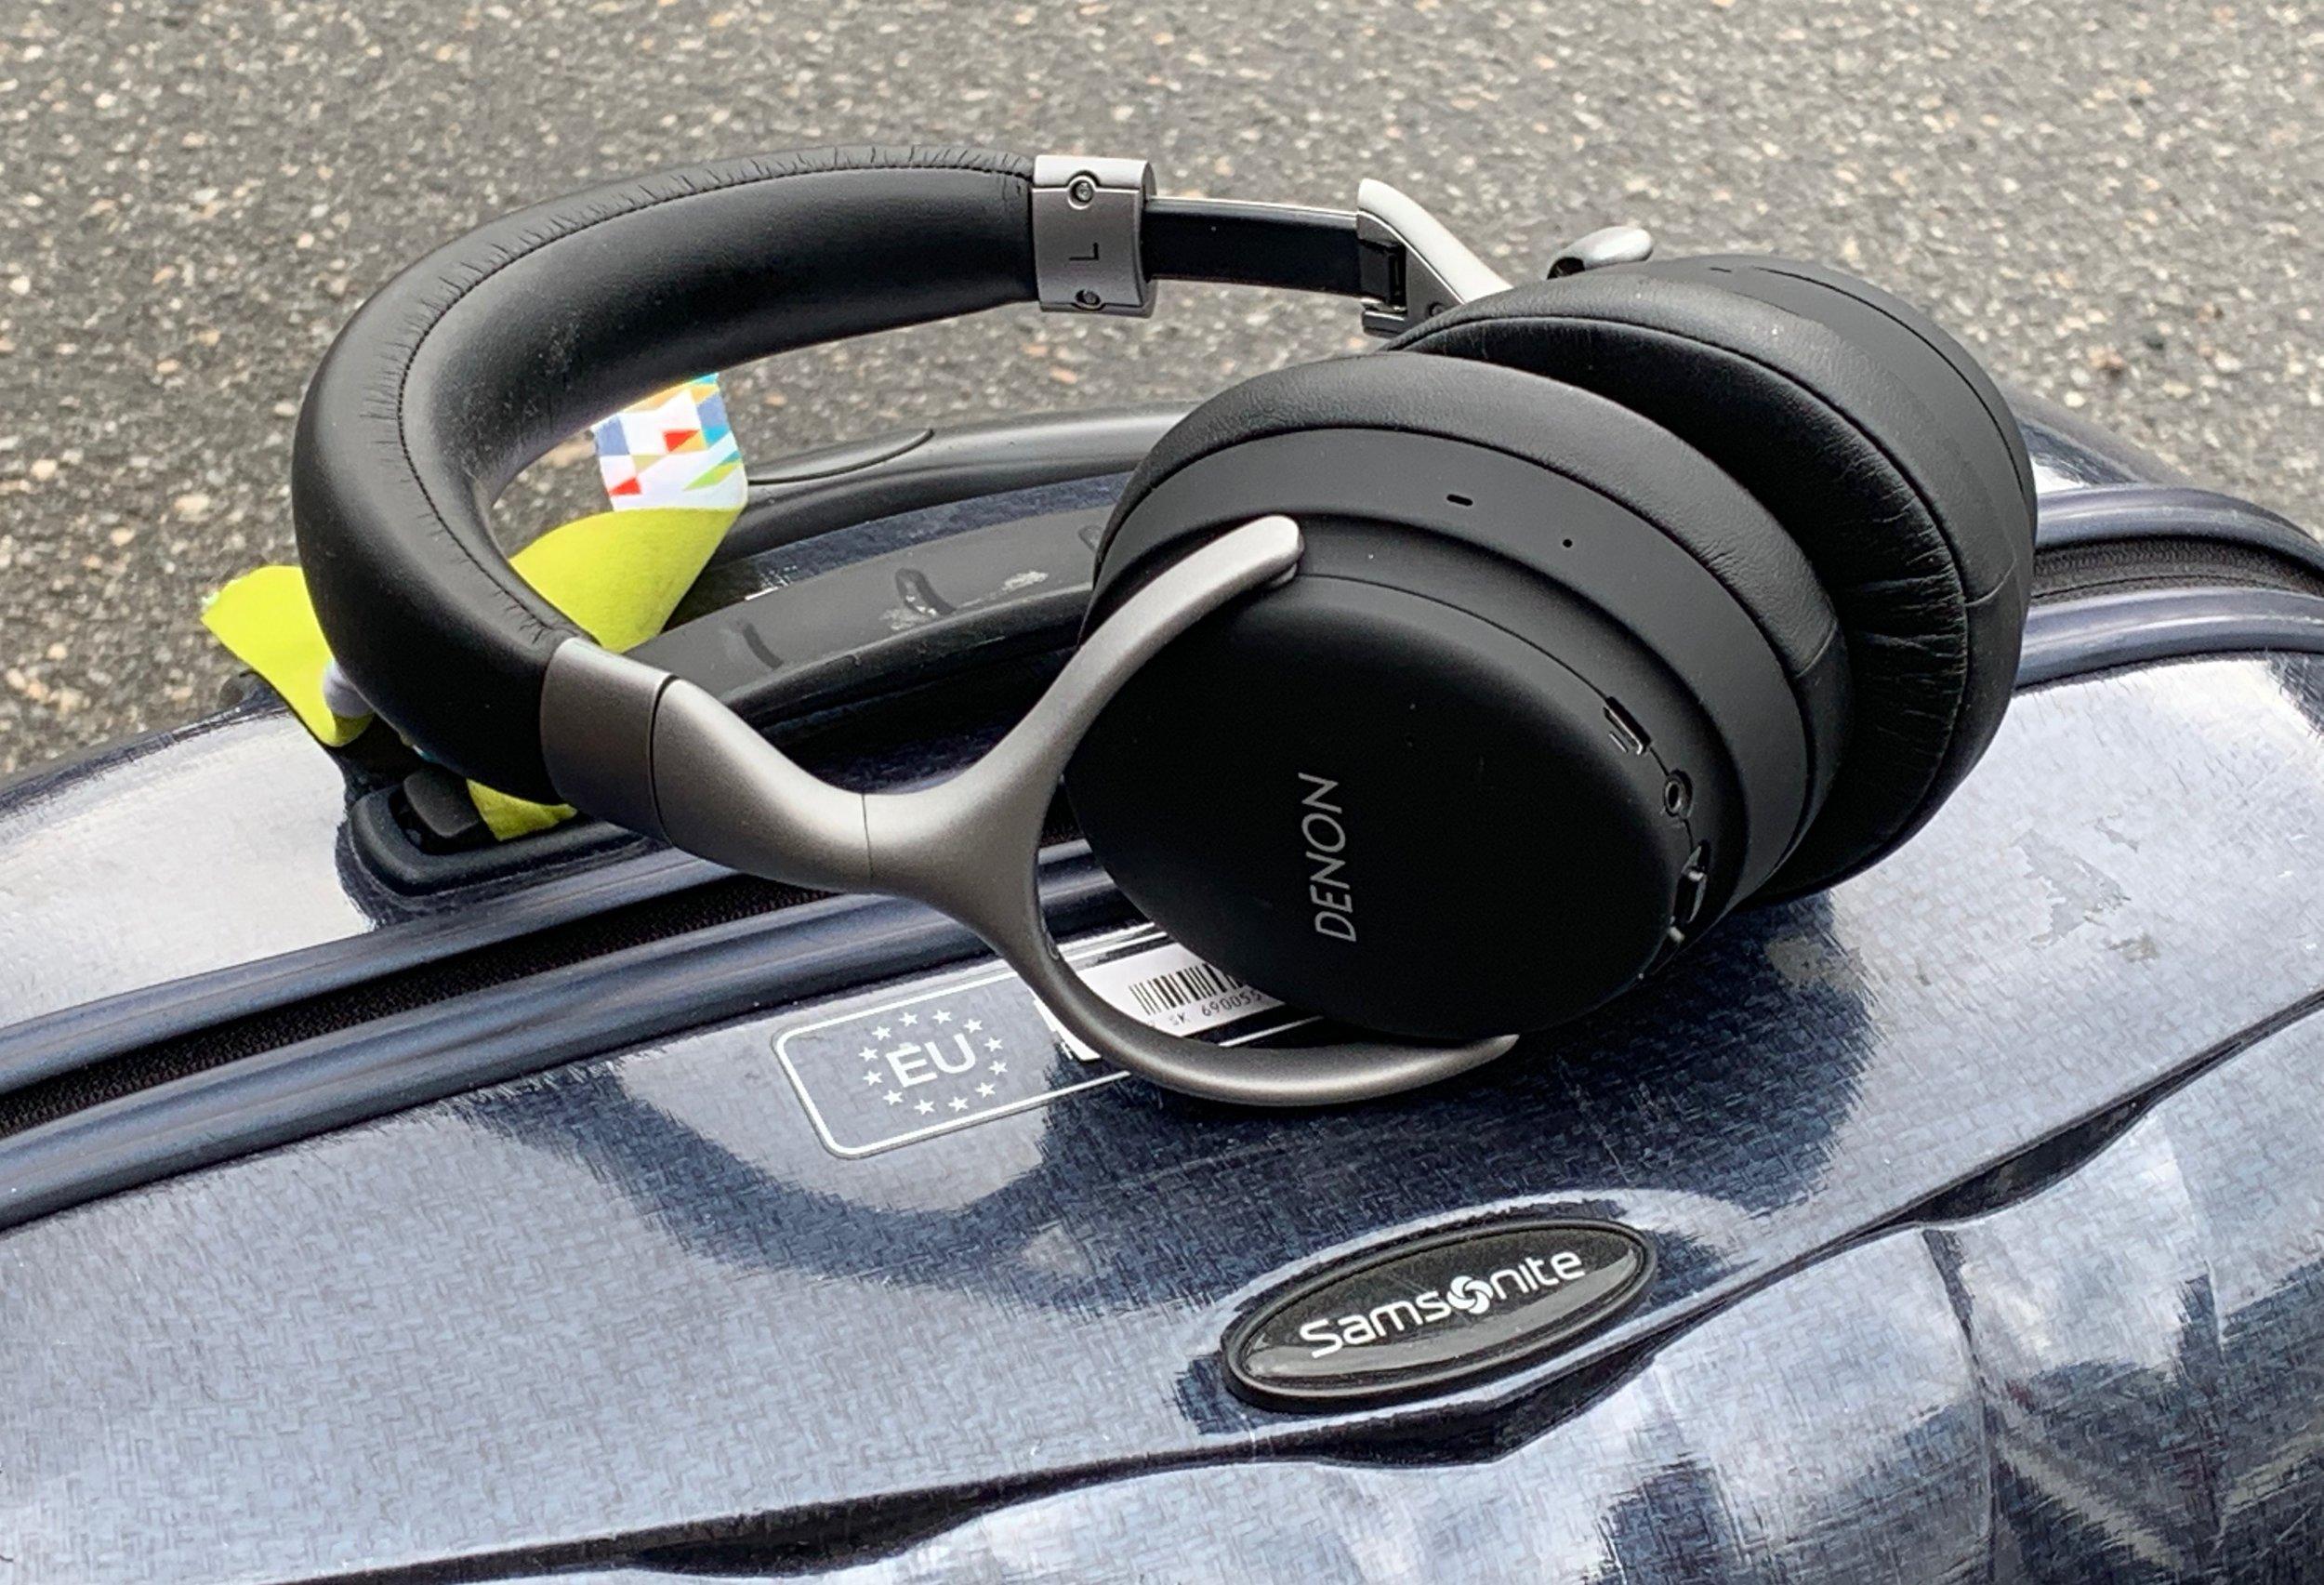 Klar for nye turer med støydempende hodetelefoner. Foto: Odd Roar Lange